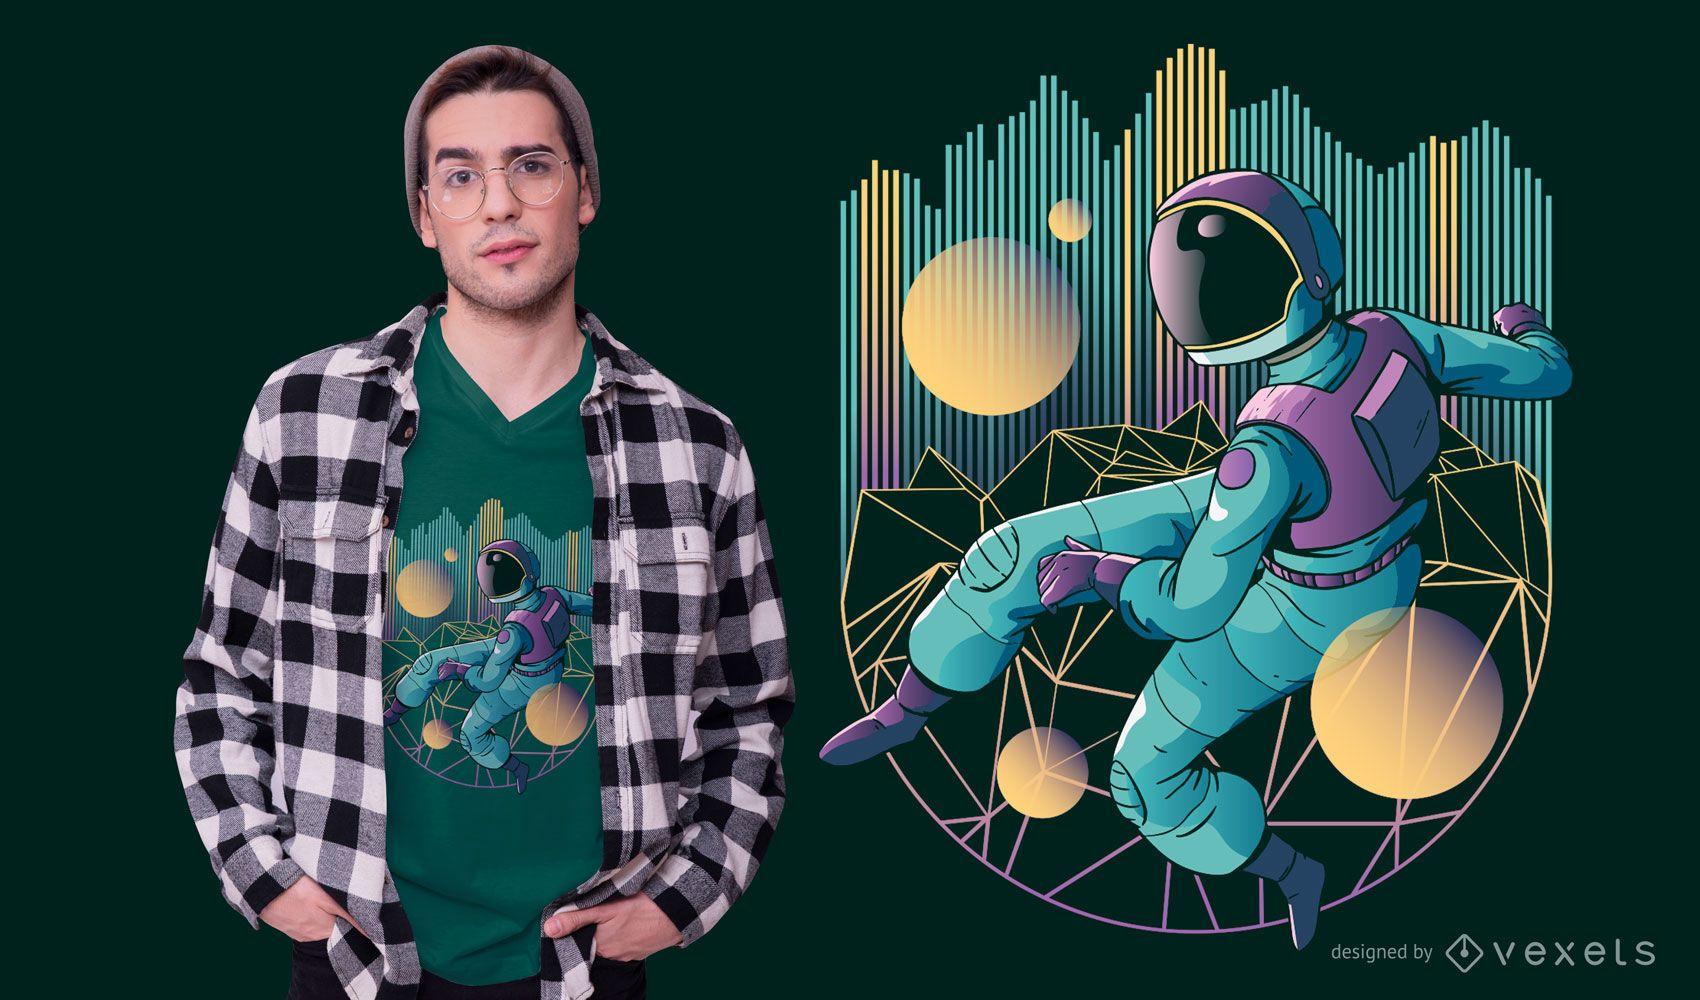 Techno astronaut t-shirt design